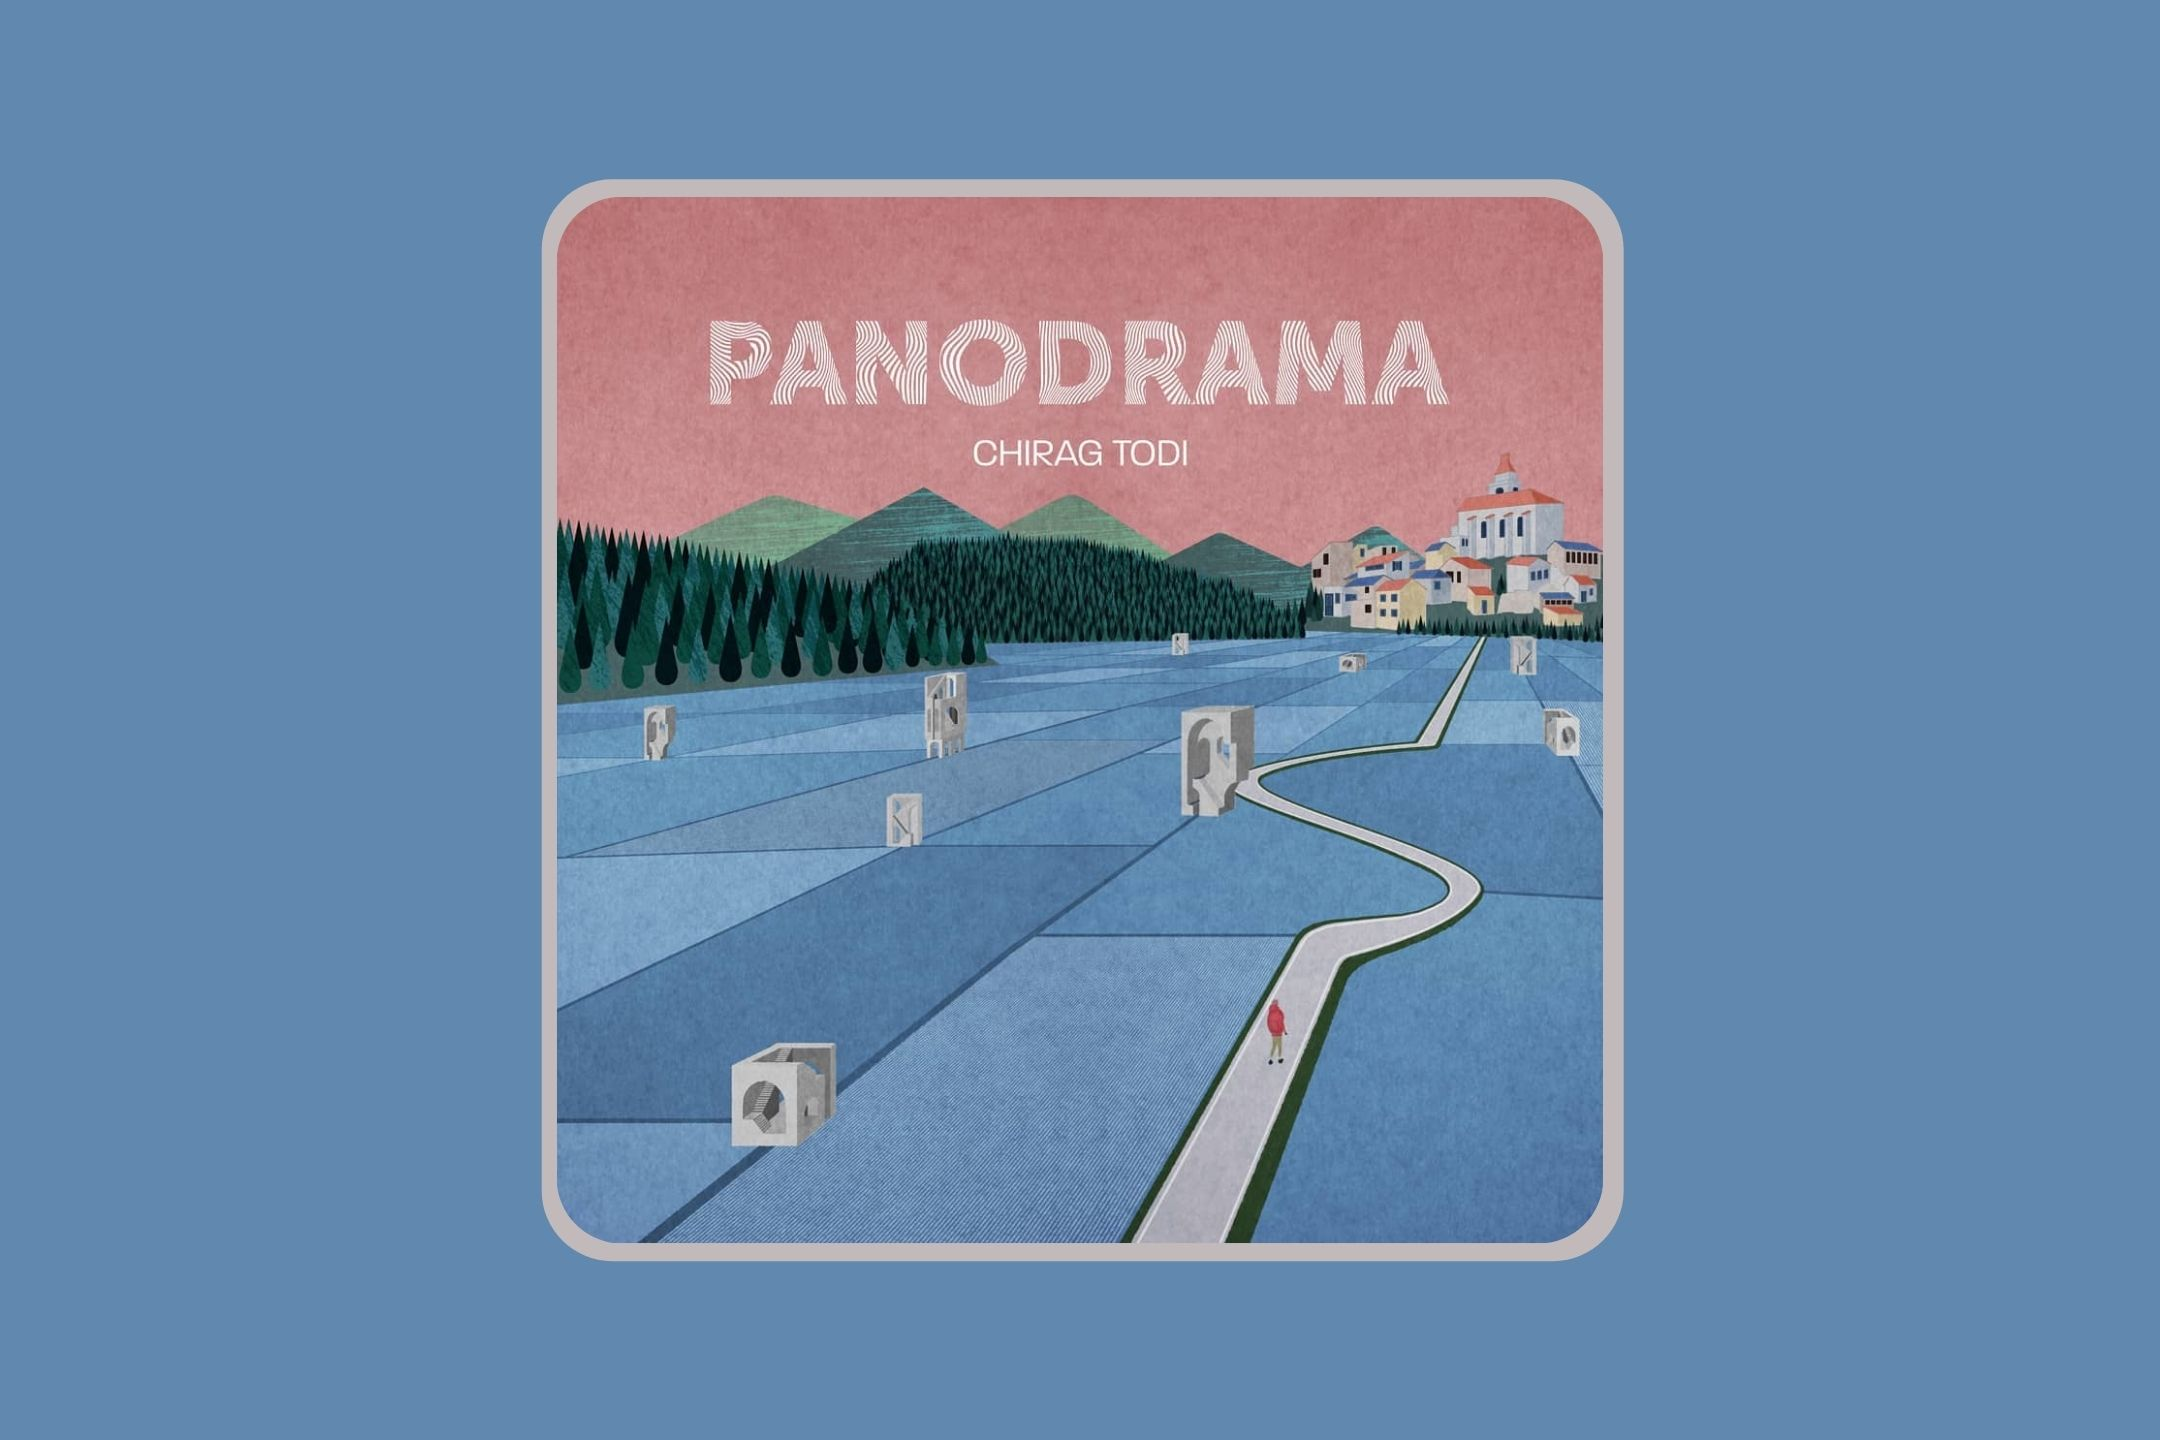 Panodrama by Chirag Todi - Review